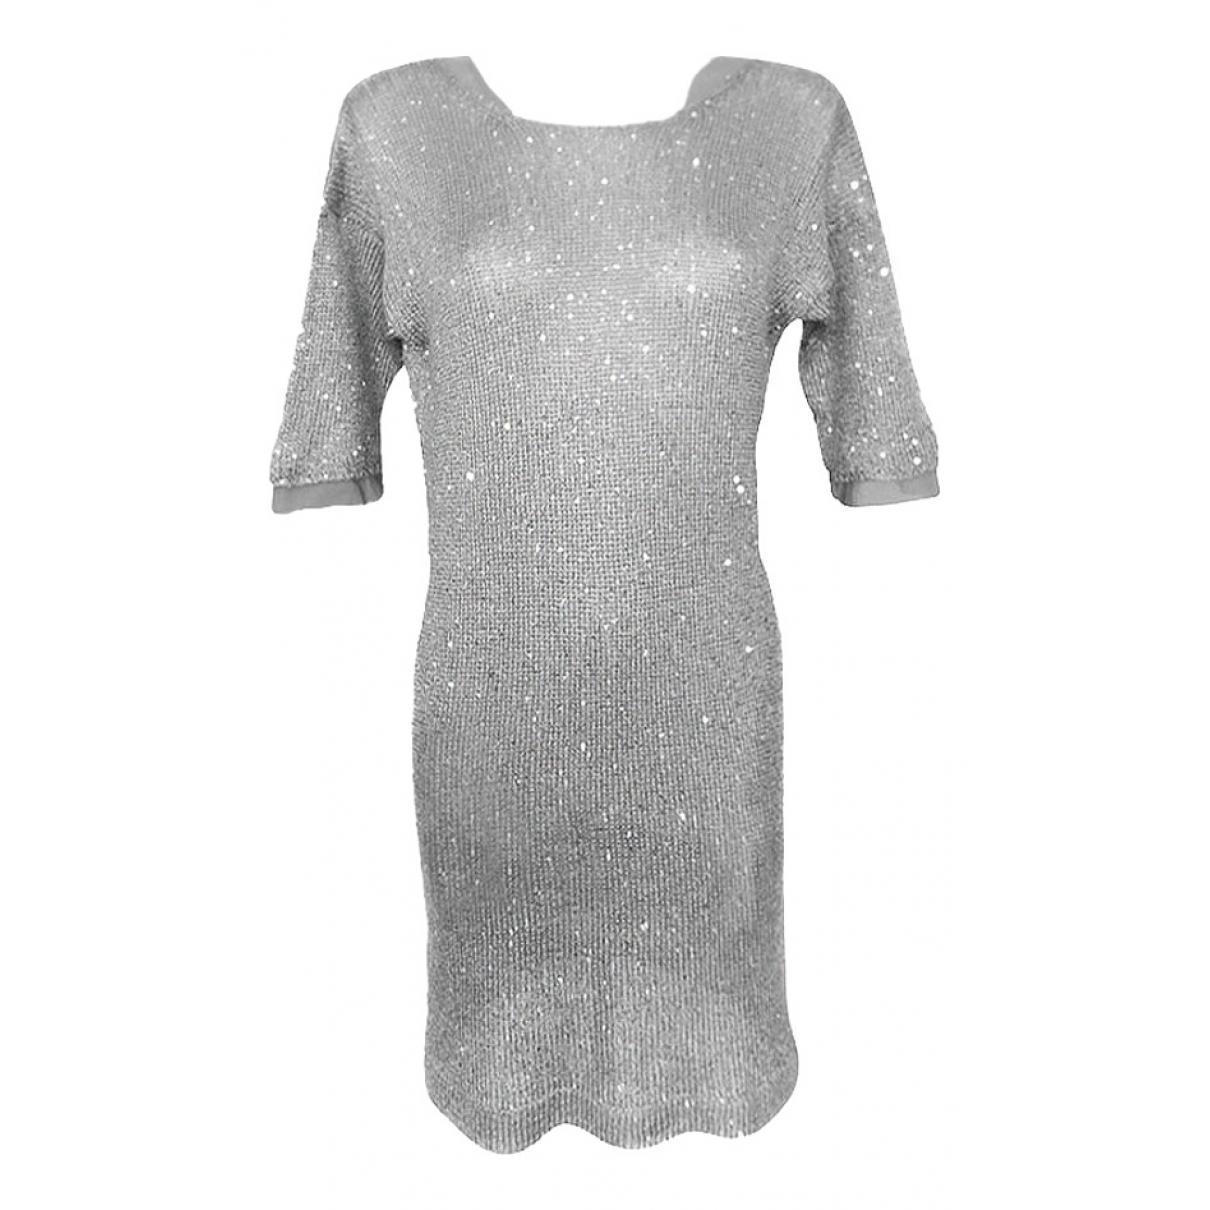 Stefanel \N Silver dress for Women L International